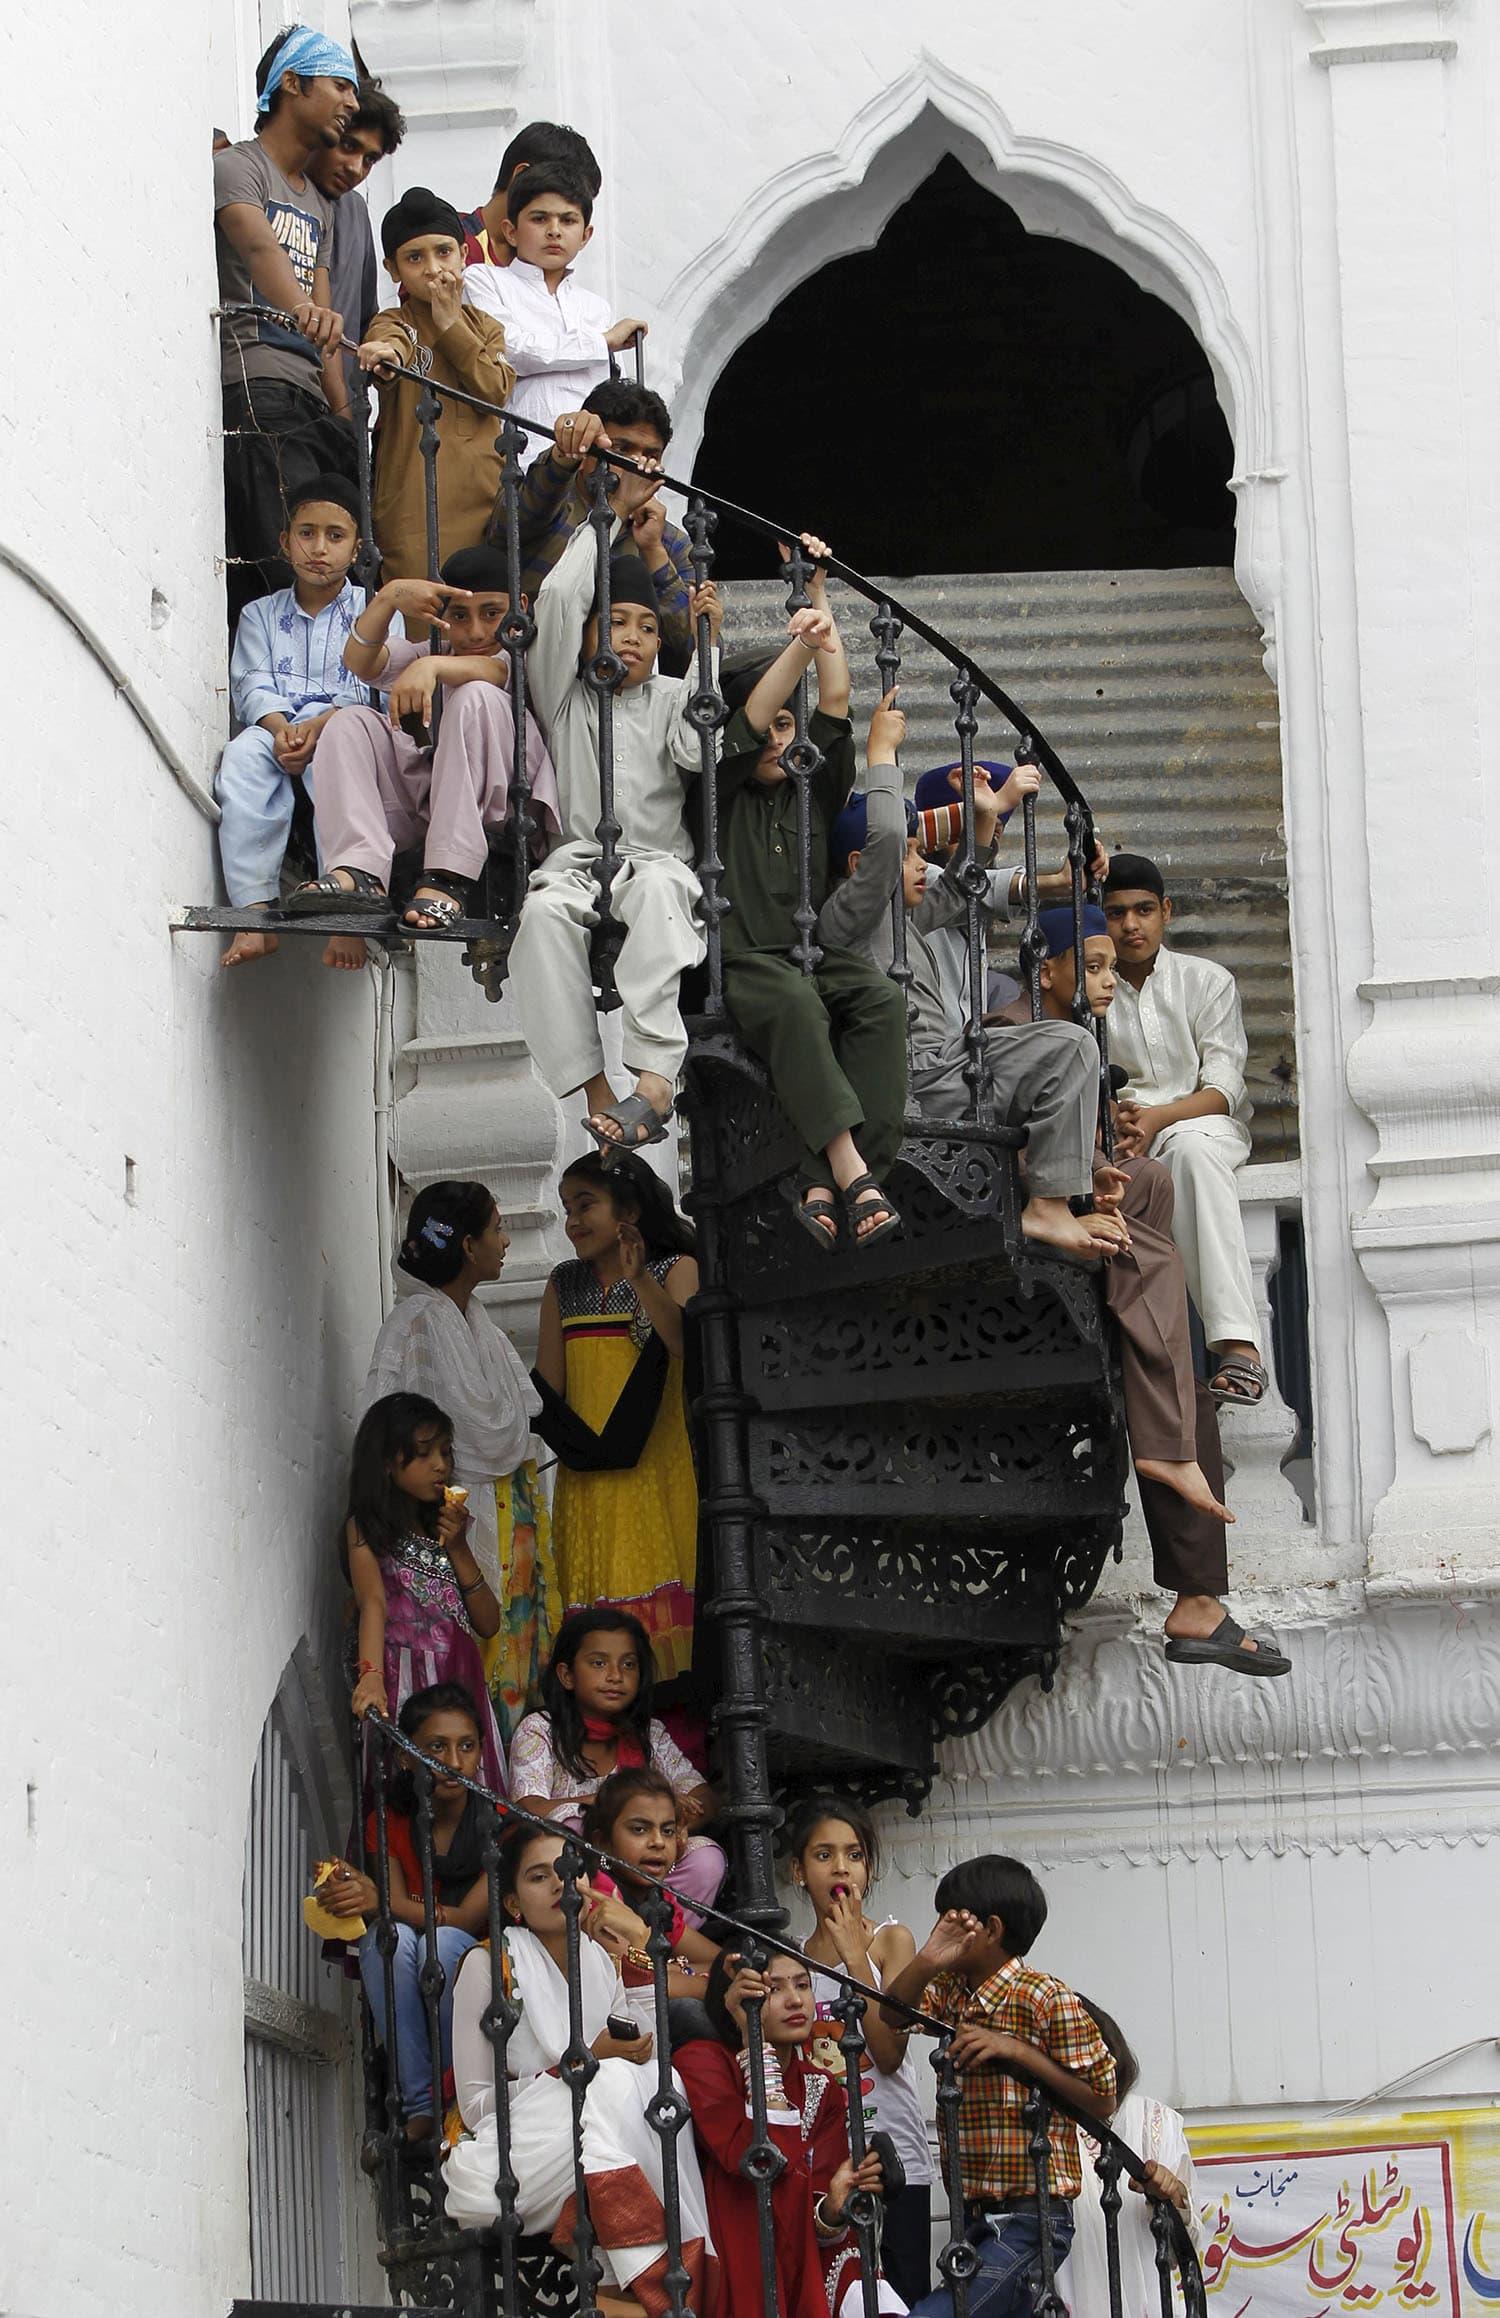 Children watch the Baisakhi festival at Panja Sahib shrine in Hassan Abdal.— Reuters